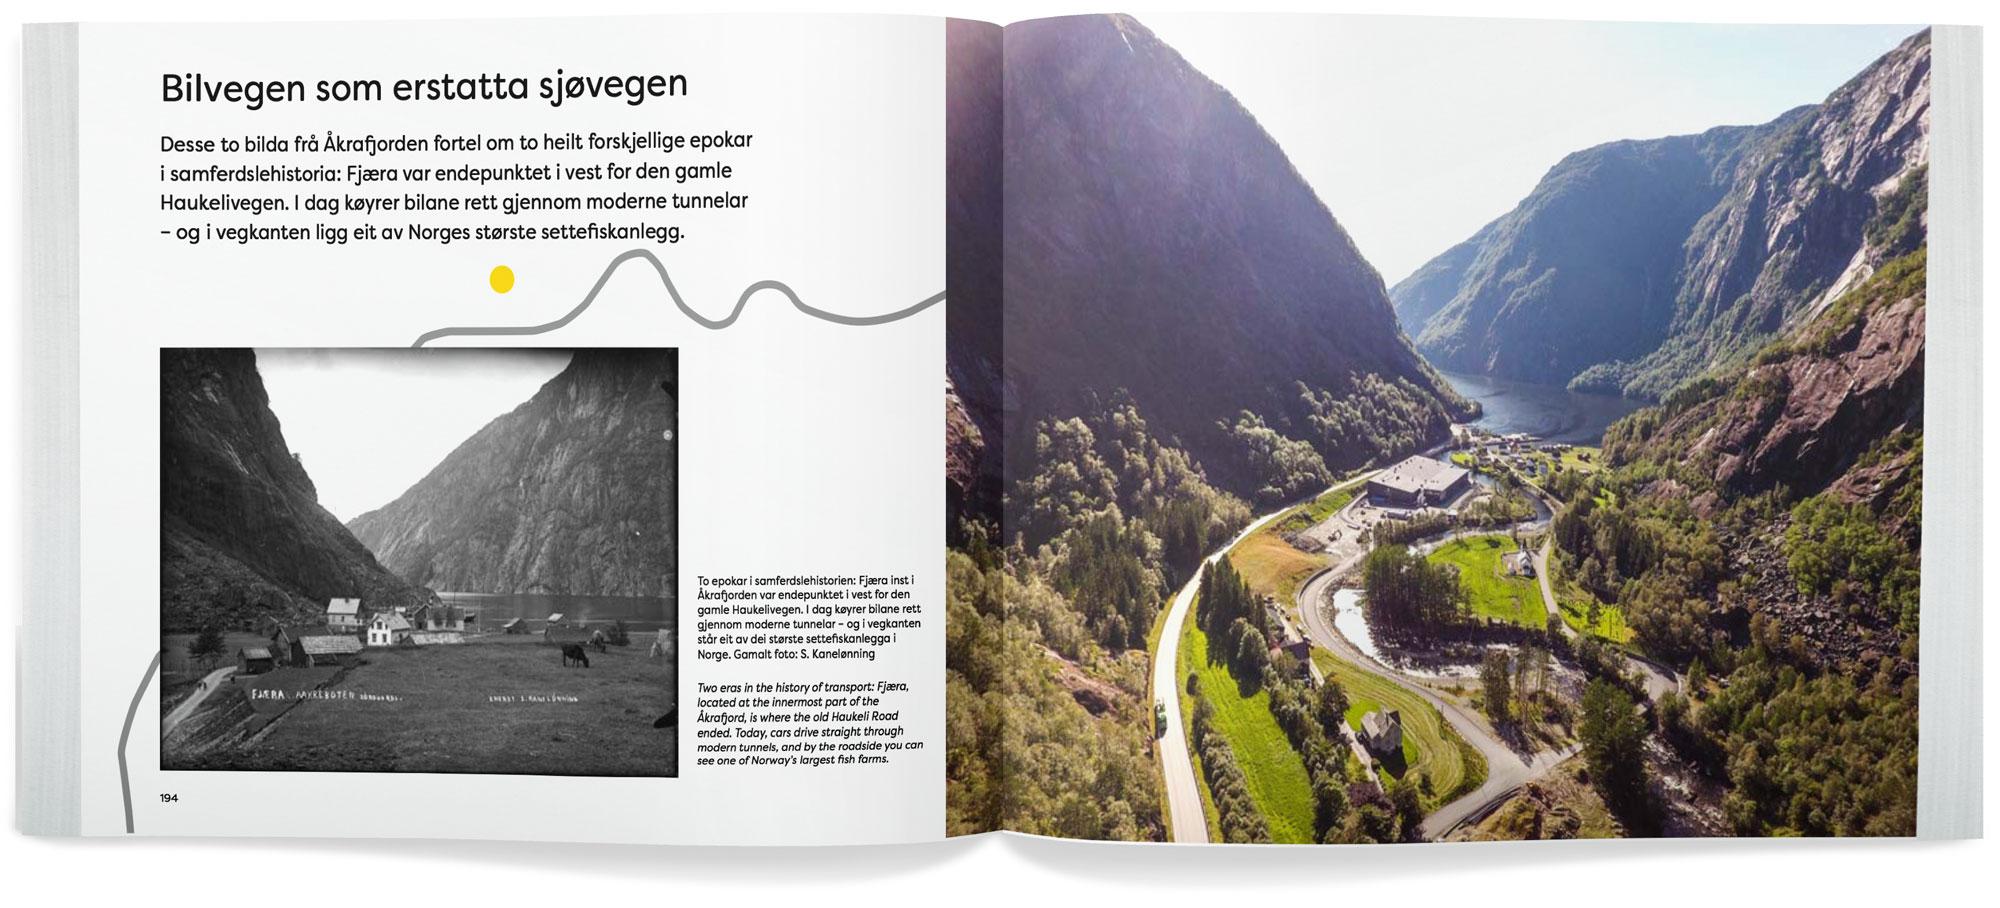 Plus-Book-8001-2017-10-15_1_2_3_4_5_6_7.jpg